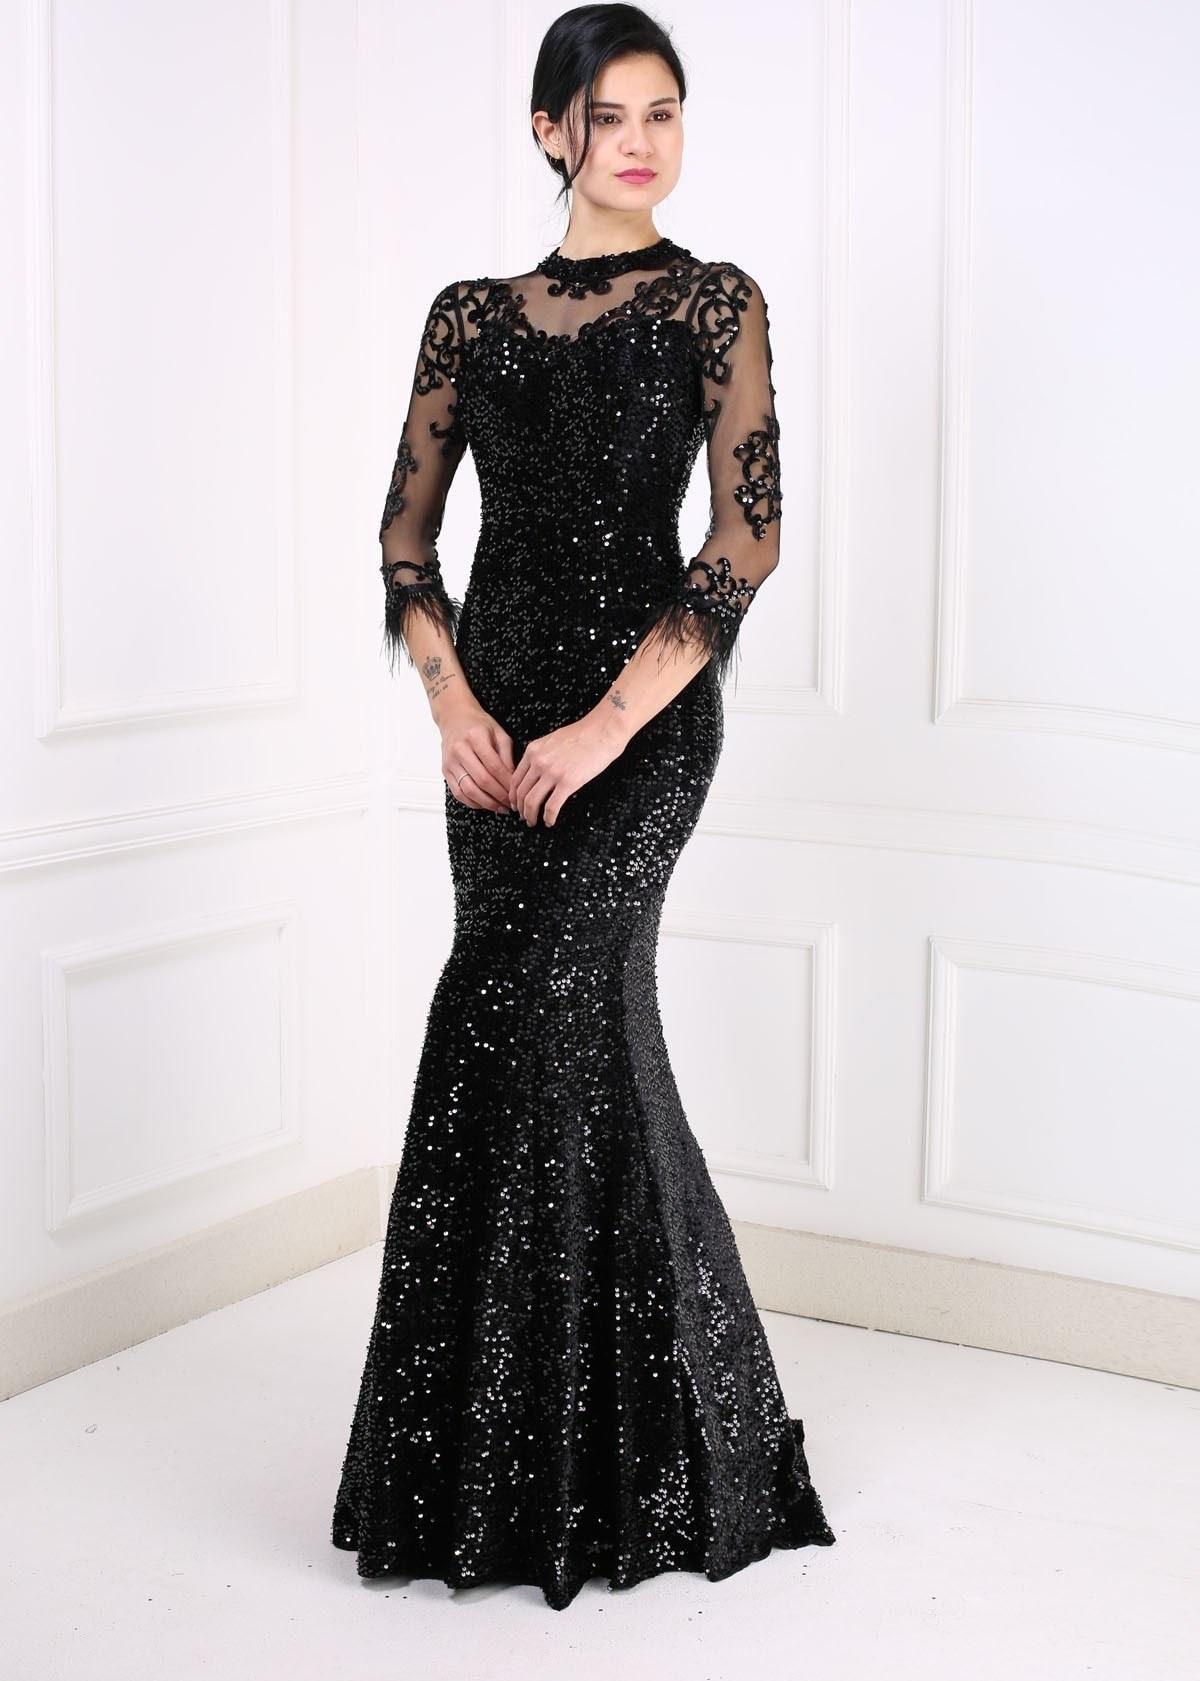 image لباس مجلسی بلند برند Abiyeniall کد 1609715702